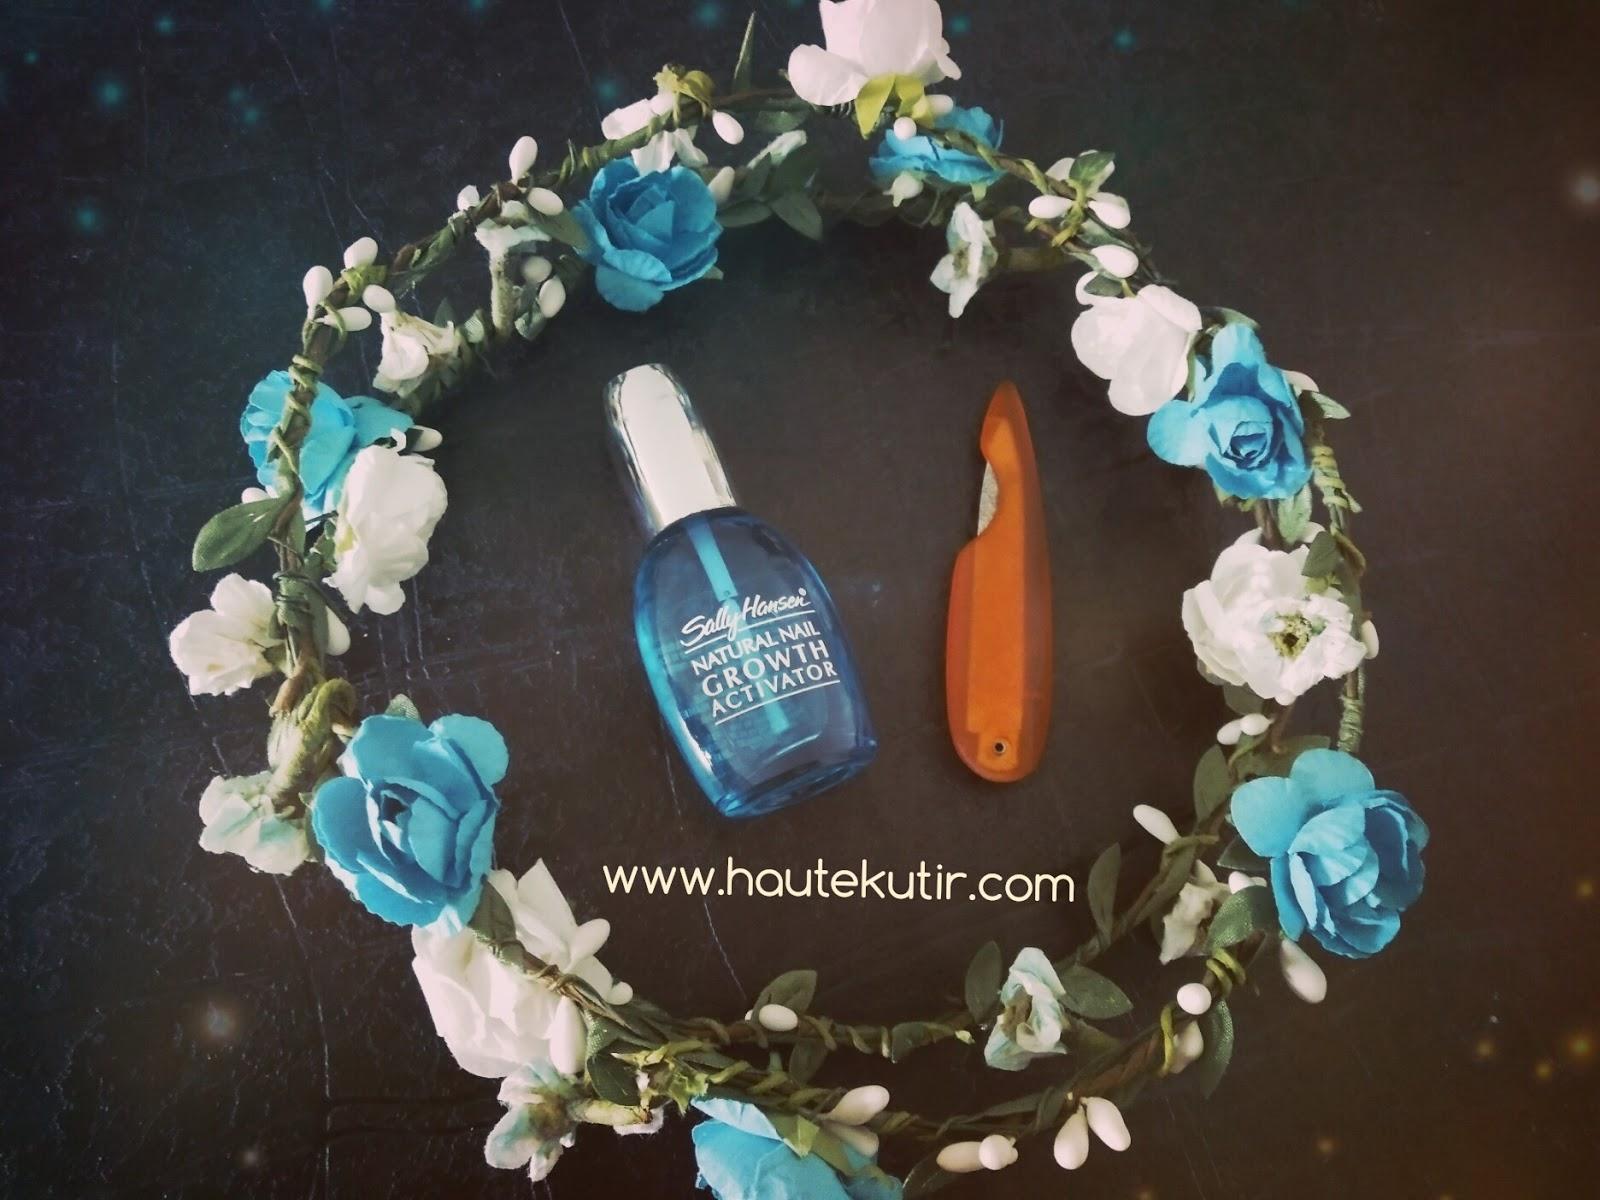 How I TLC My Nails with Sally Hansen #AskEkta #BeautyTips - Haute Kutir